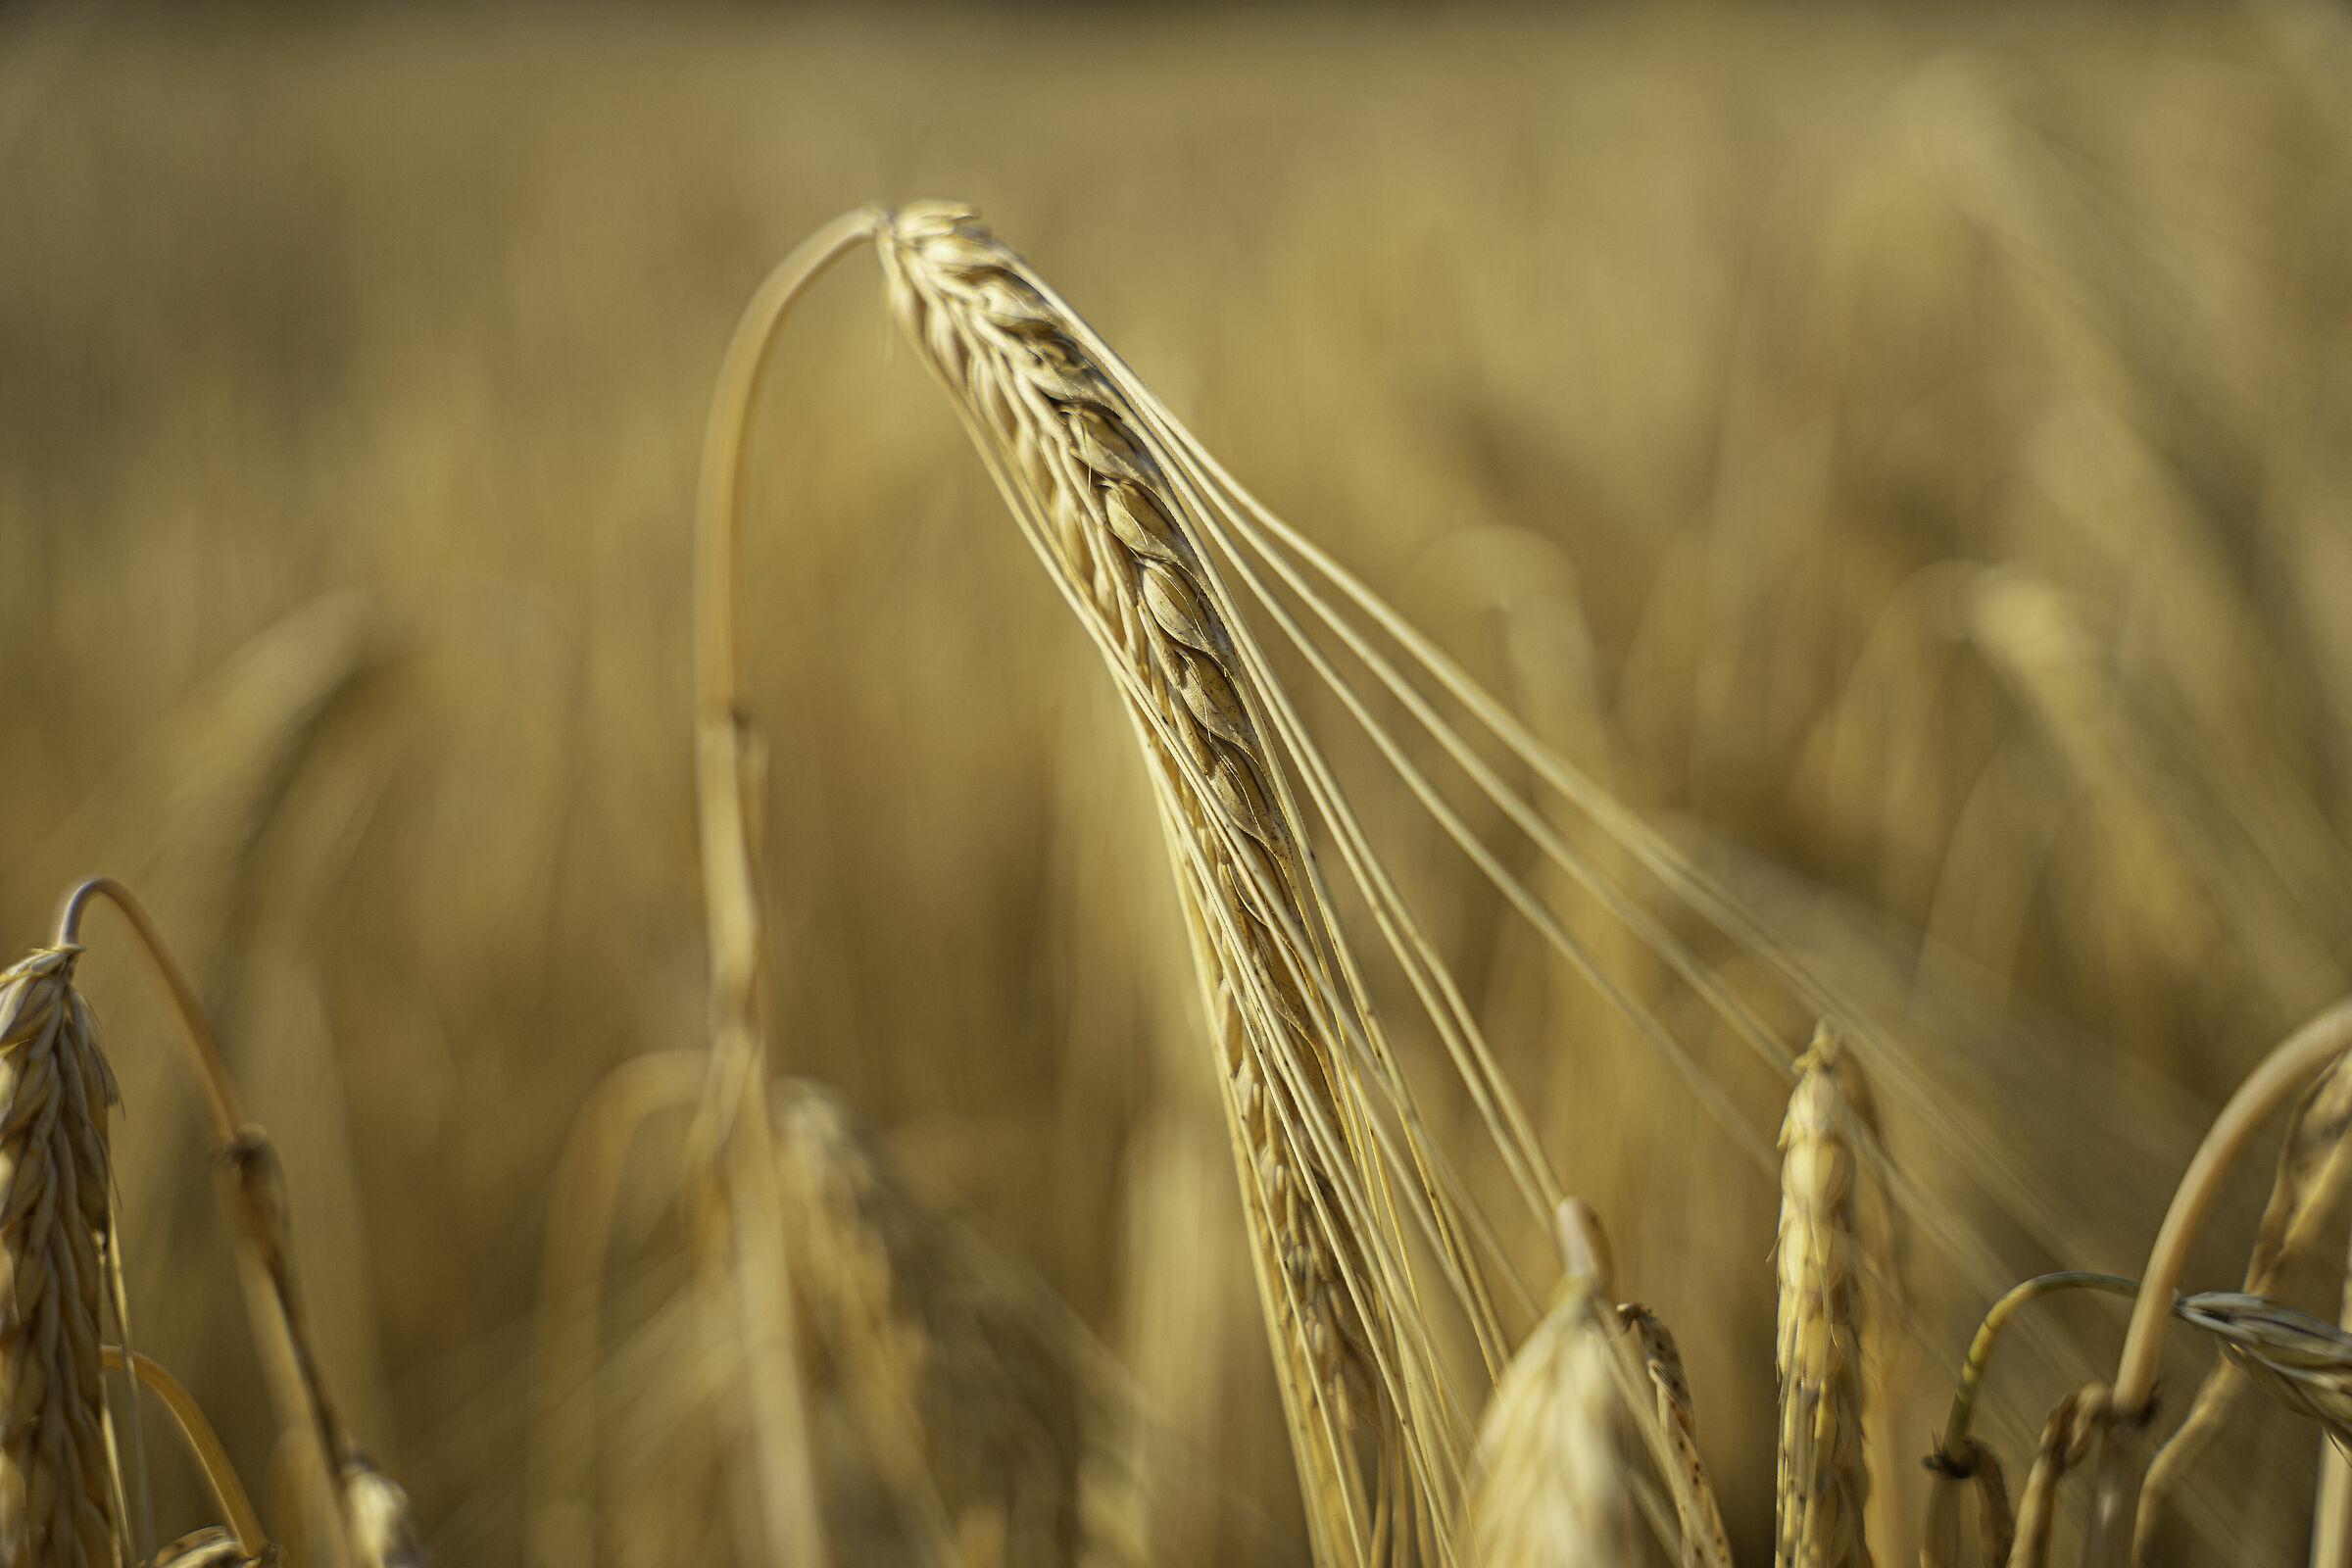 simple complexity (full ripe grain)...